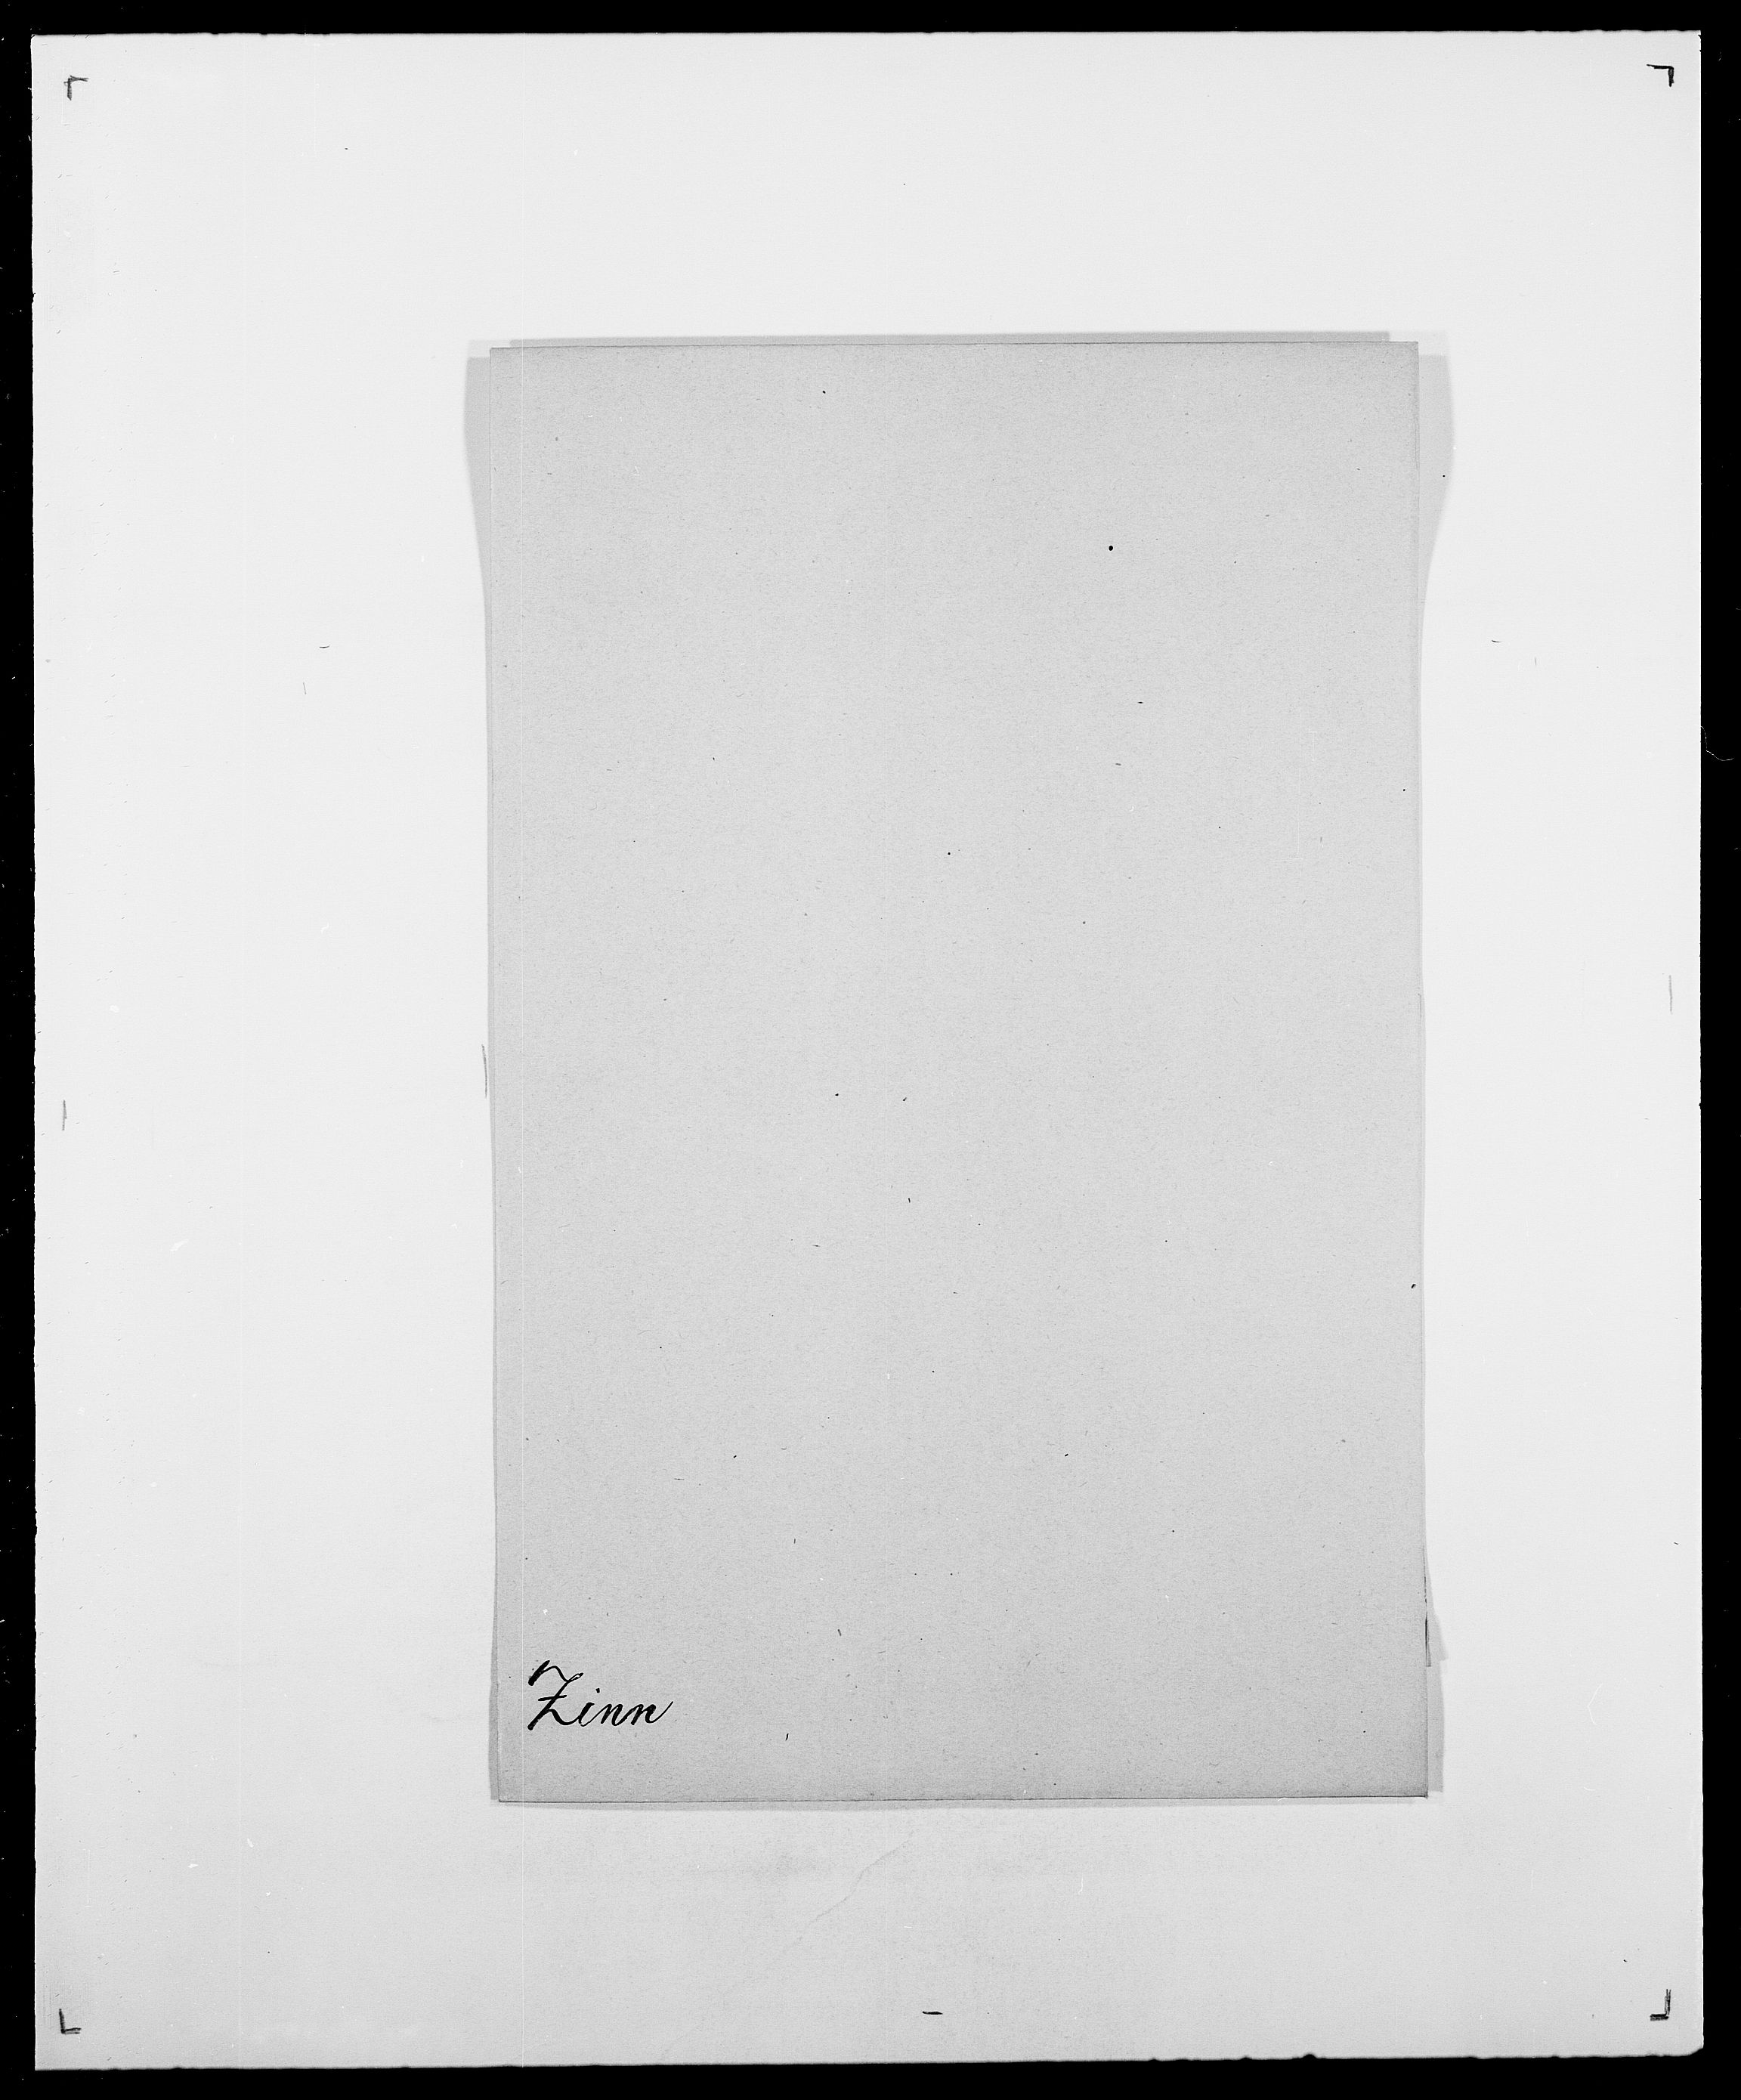 SAO, Delgobe, Charles Antoine - samling, D/Da/L0043: Wulfsberg - v. Zanten, s. 197